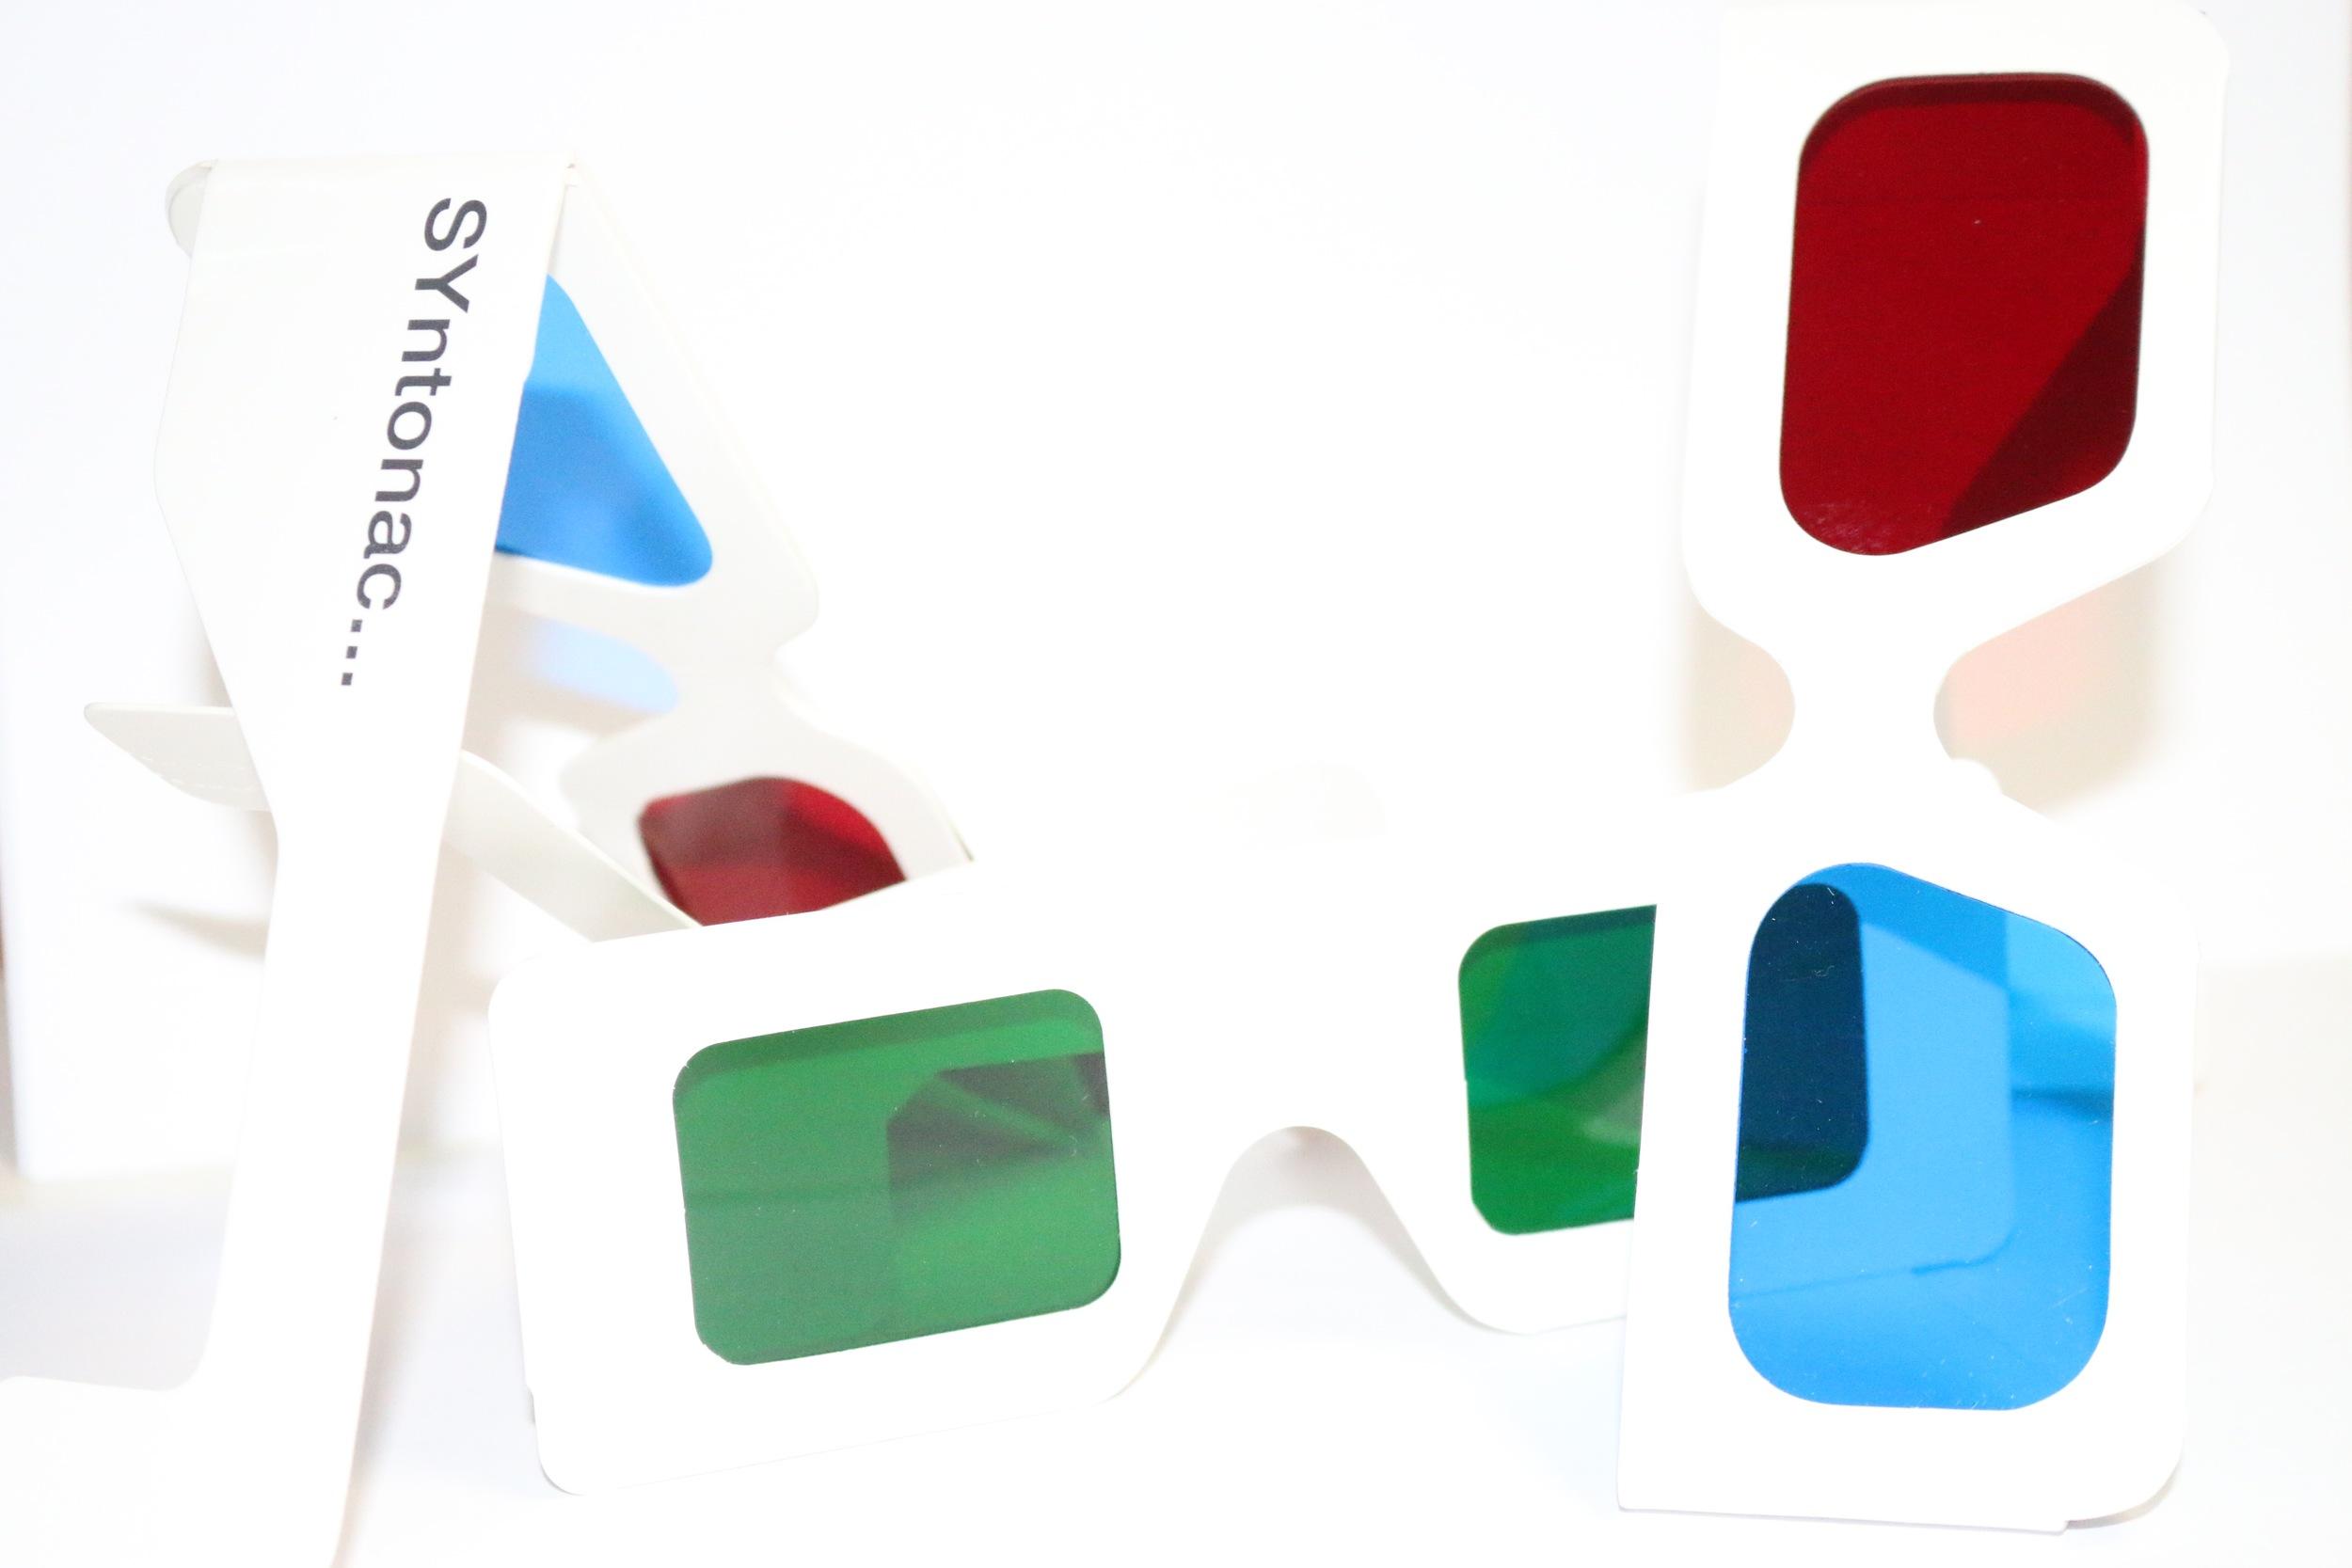 SYntonac Nascentization goggles